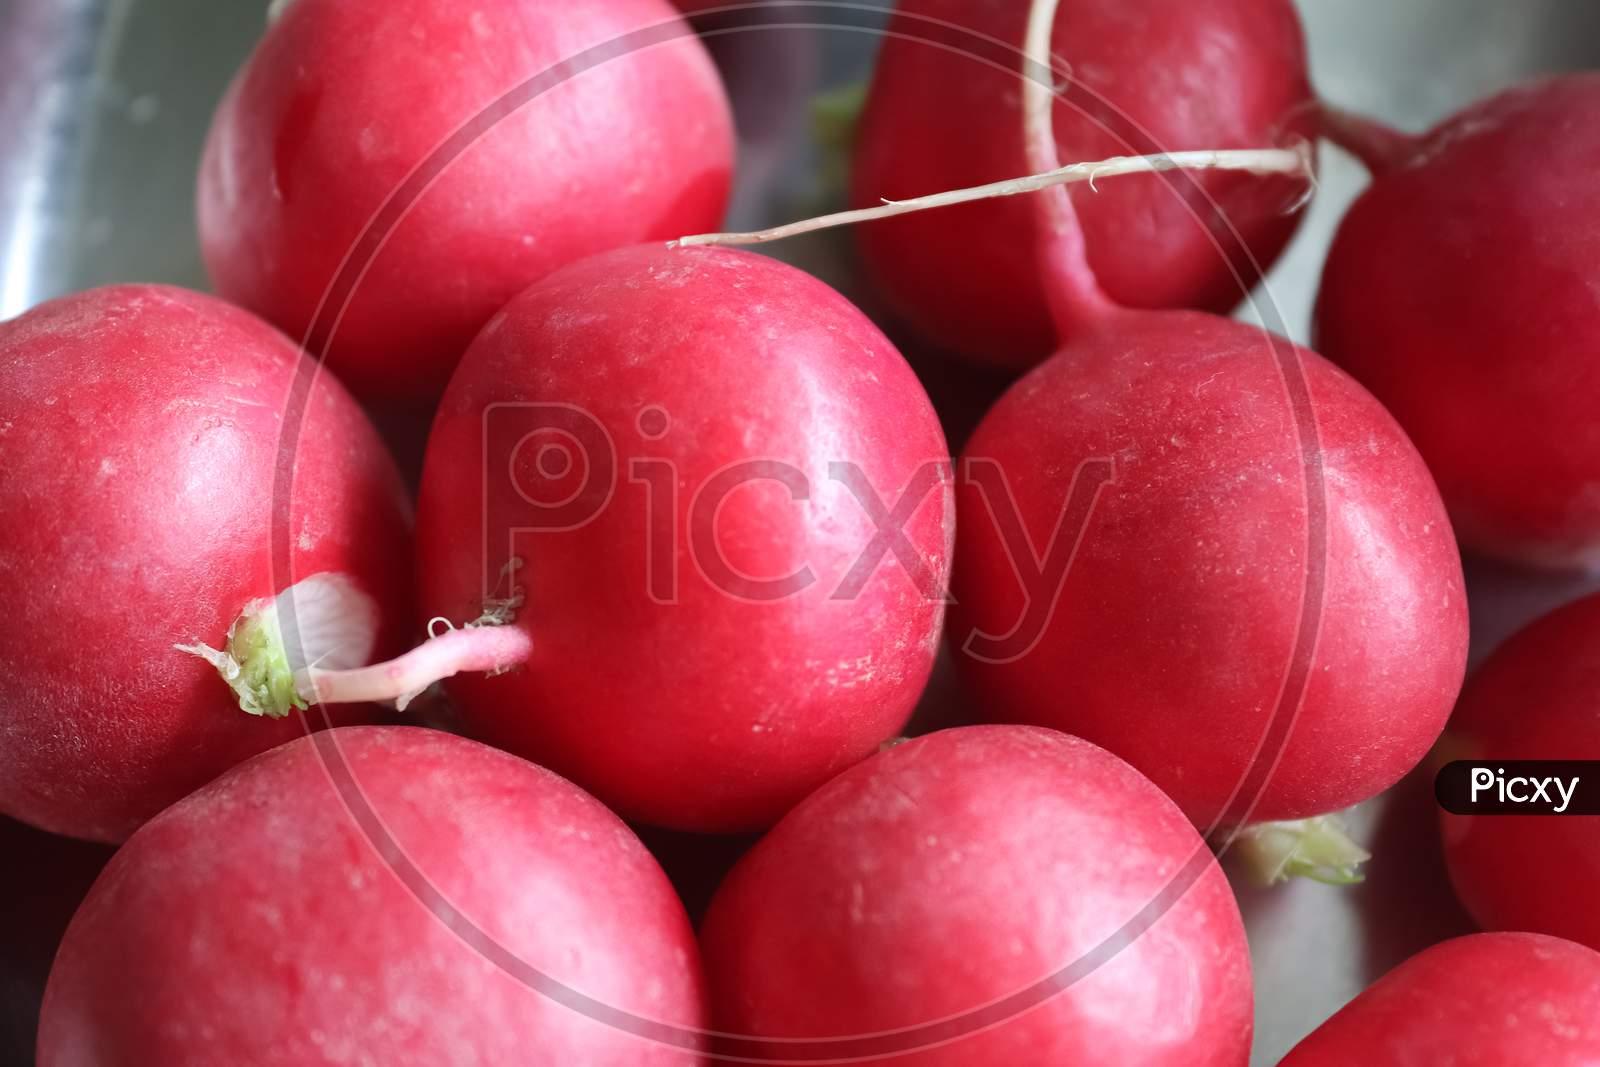 Bunch Of Radishes. Freshly Harvested, Purple Colored Radishes. Growing Rainforests. Growing Vegetables.Healthy Food Background. European Radishes (Raphanus Sativus).